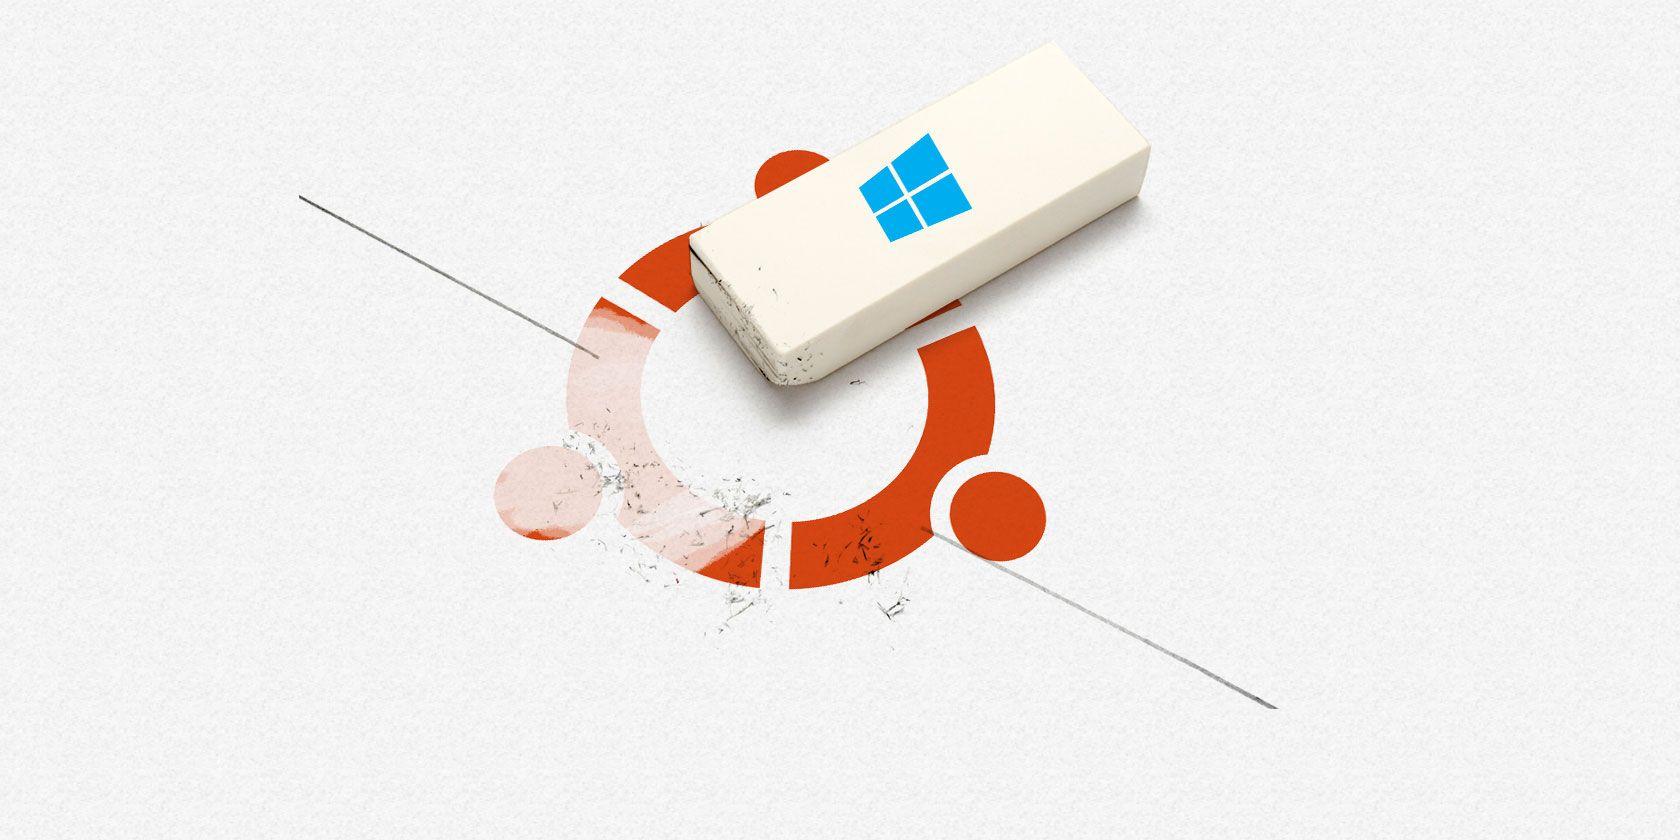 windows-update-deletes-linux